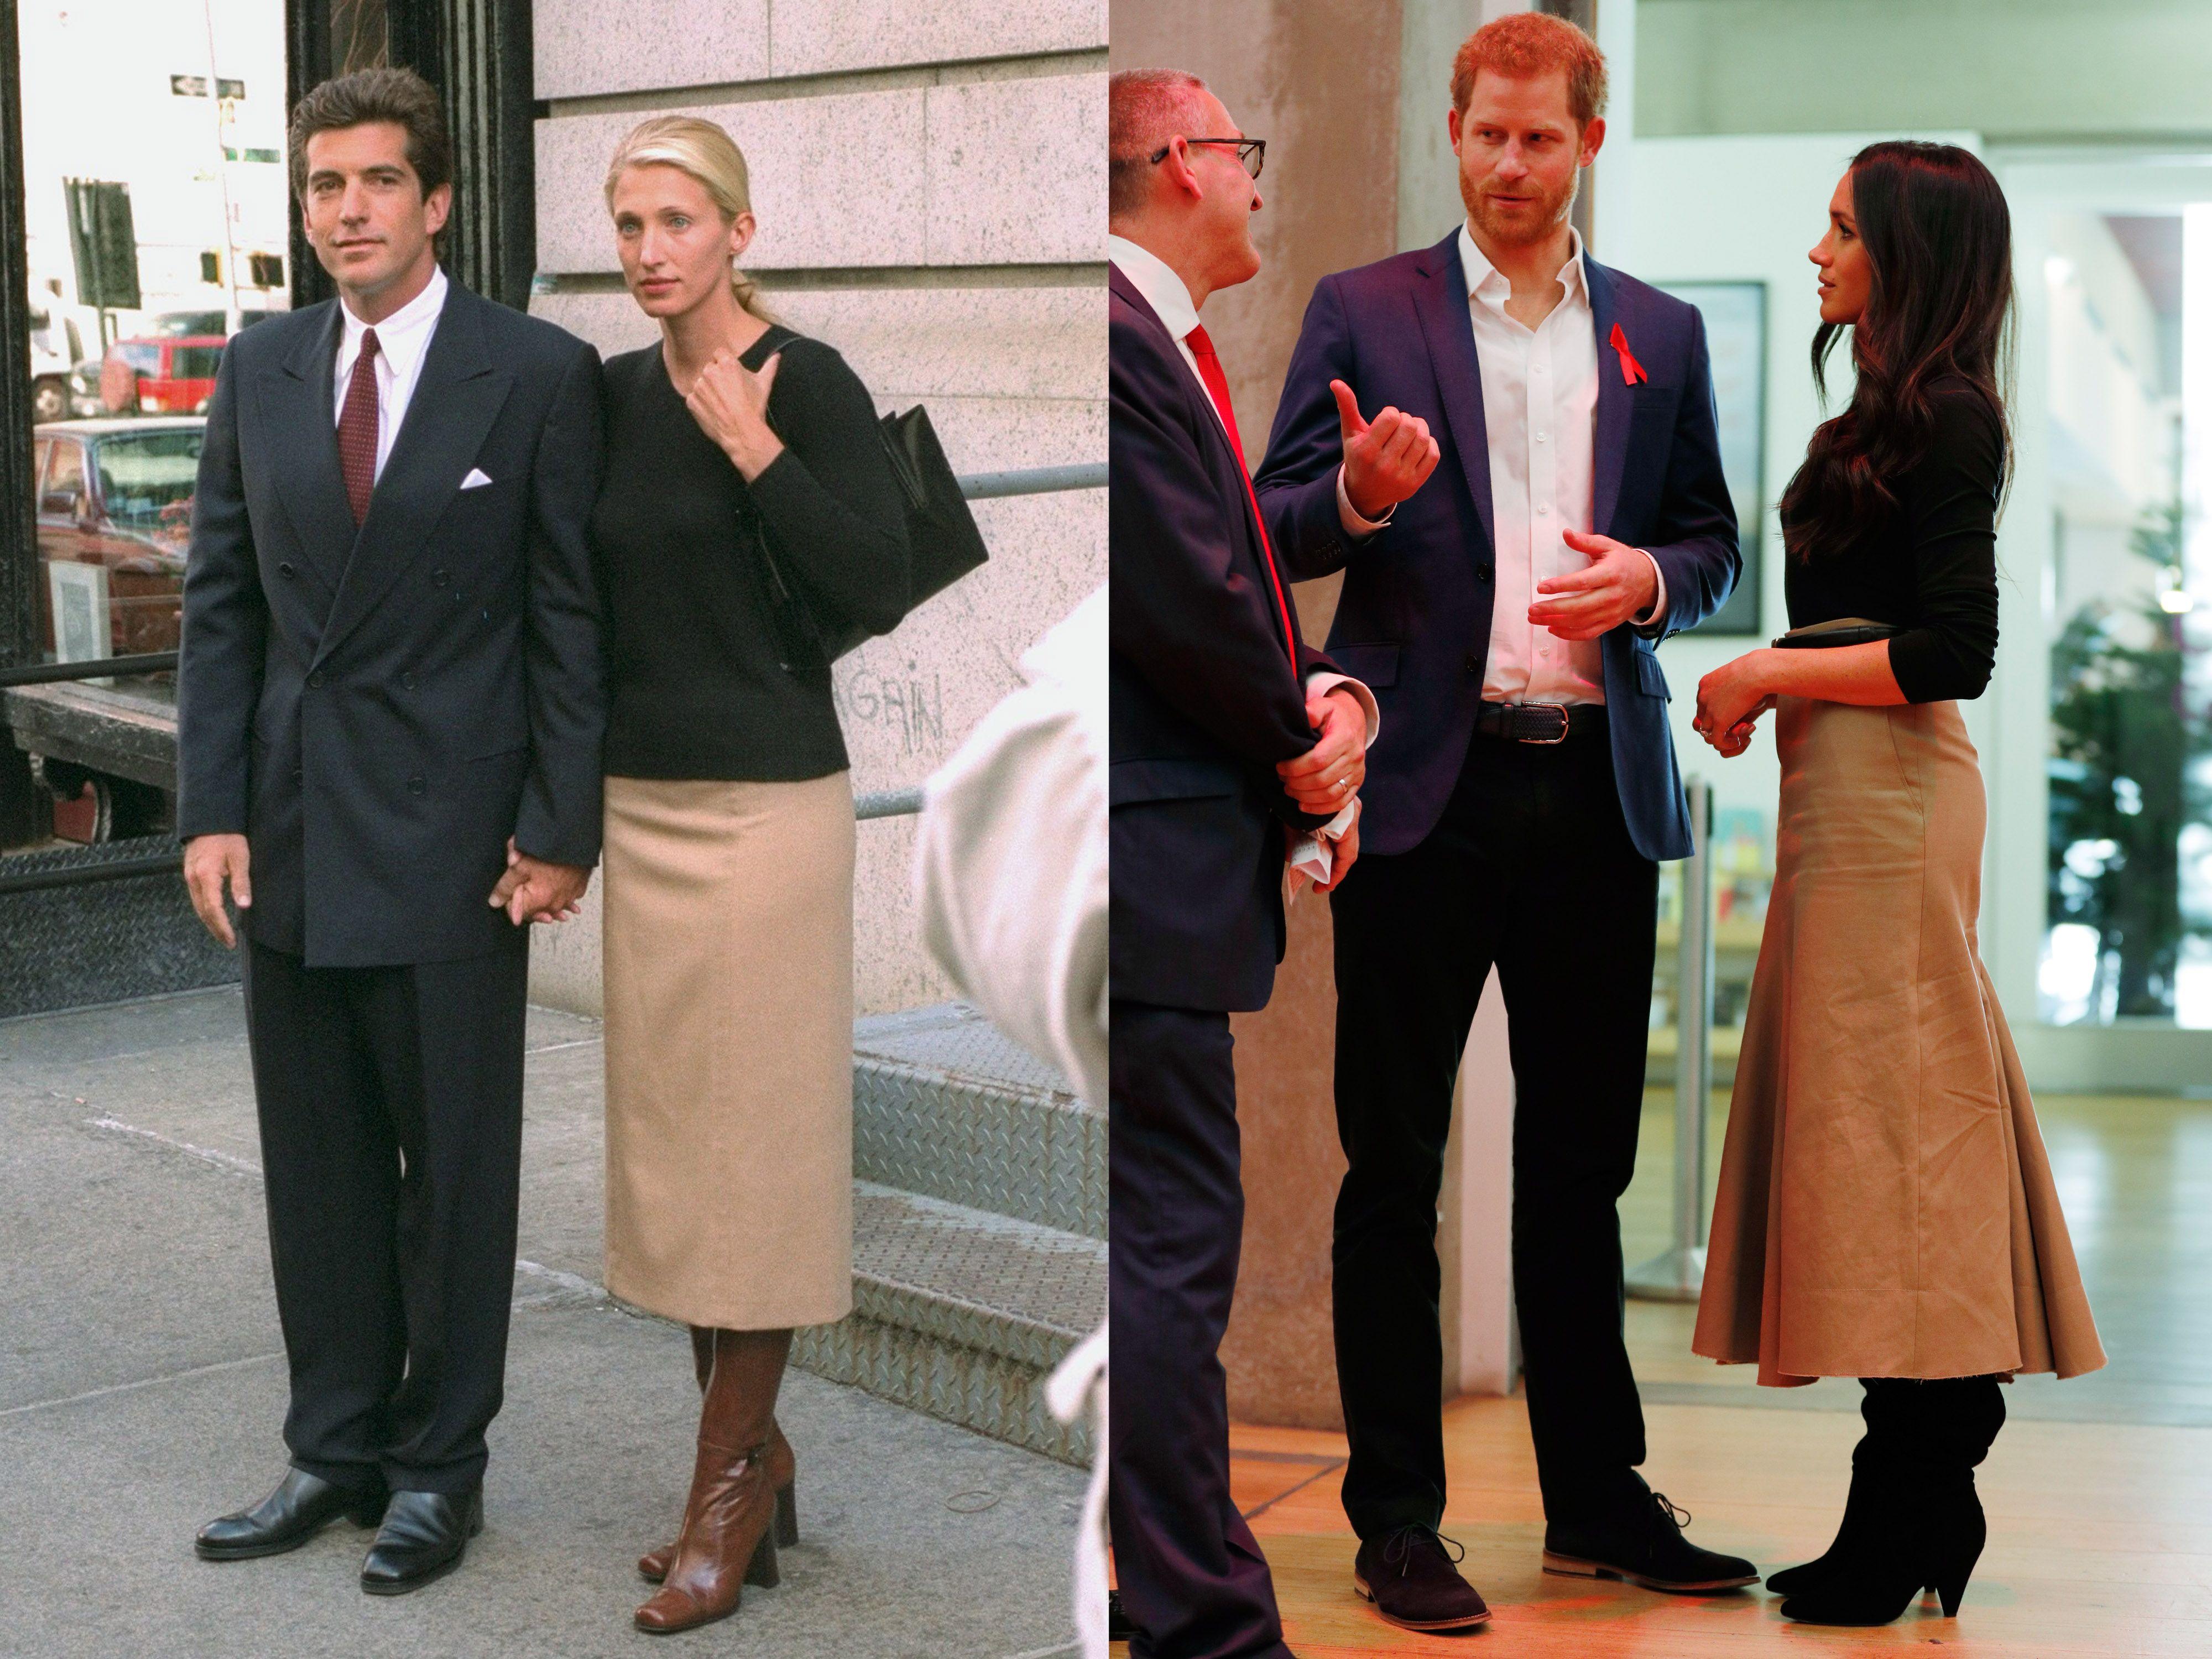 Carolyn Bessette Wedding.Meghan Markle Channels Carolyn Bessette Kennedy For Her First Royal